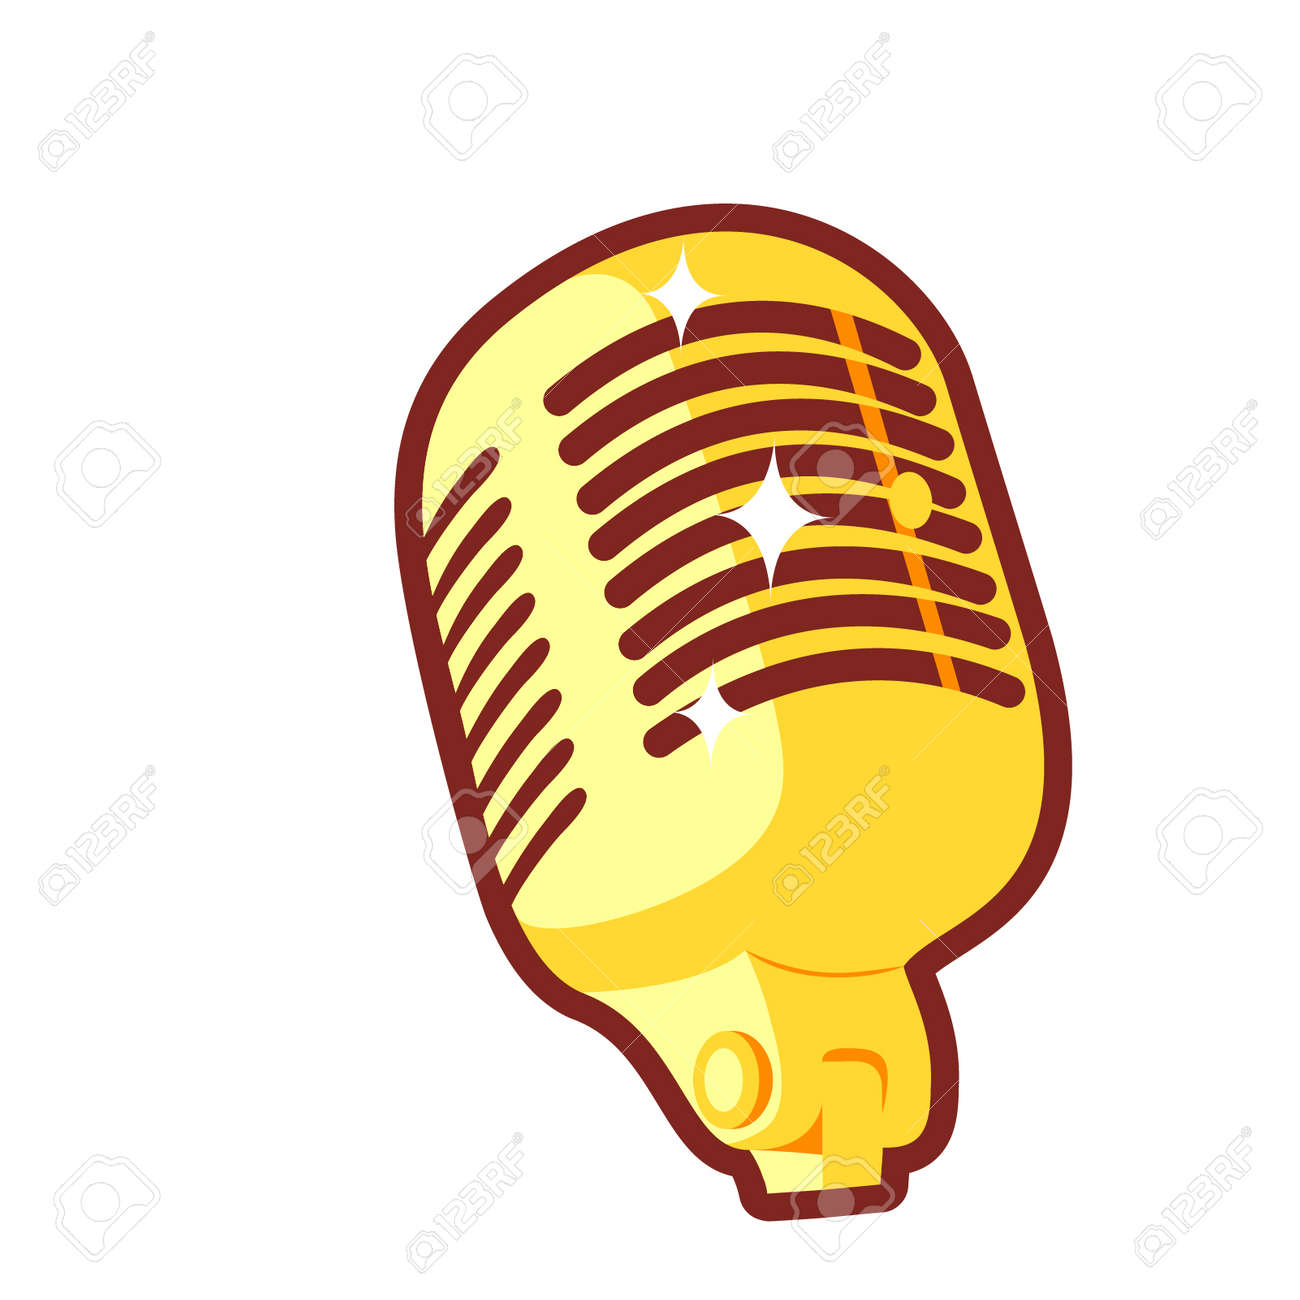 cartoon golden microphone